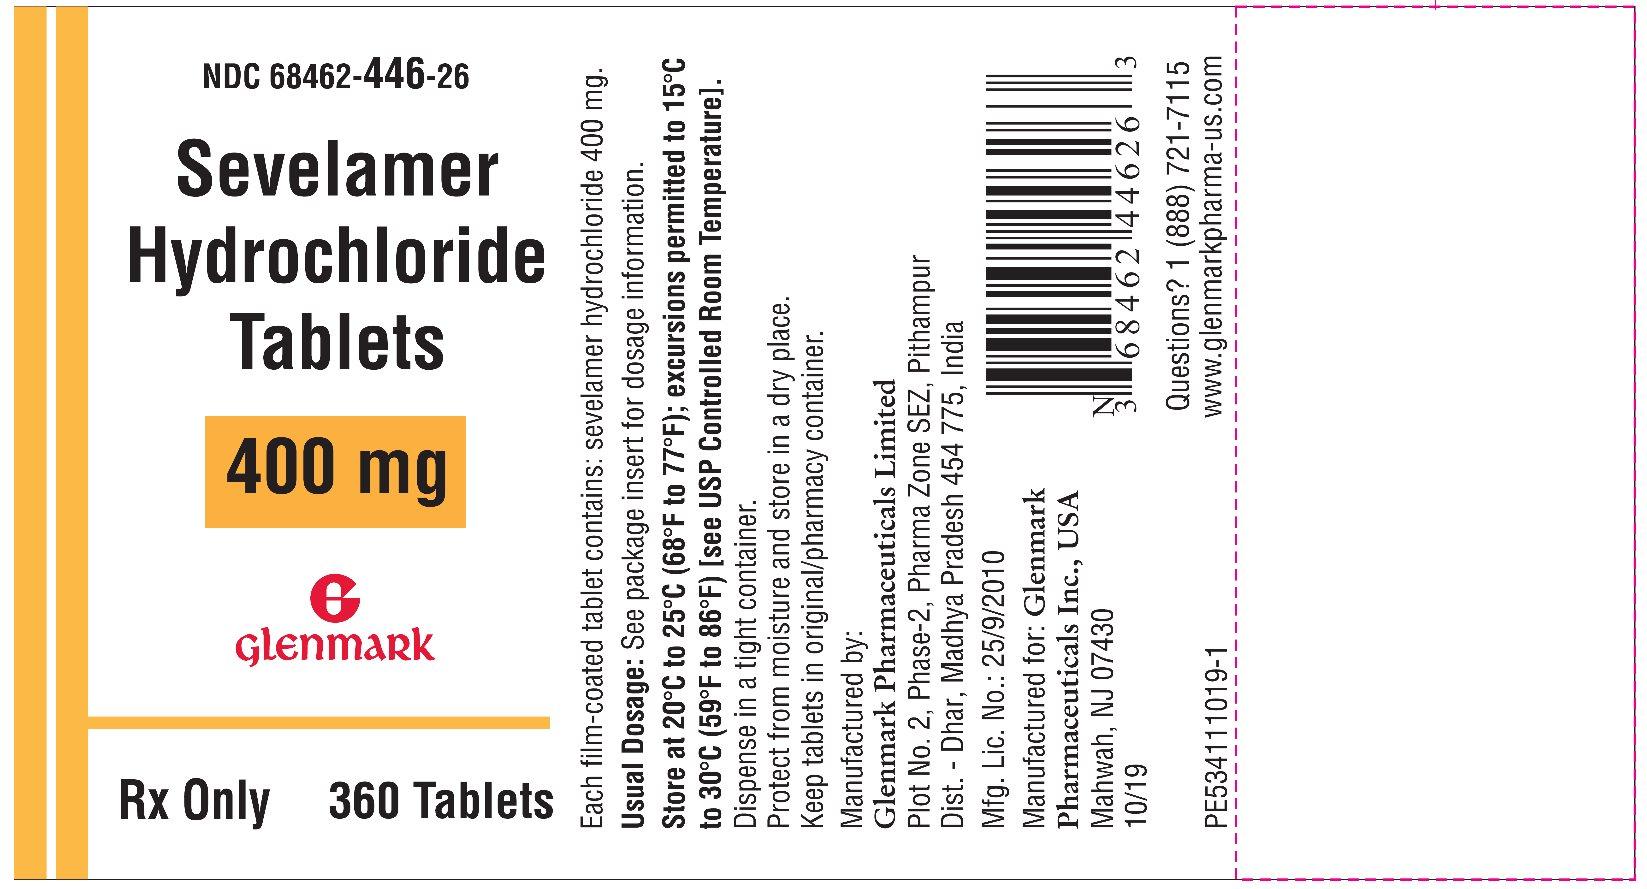 bottle-label-400-mg